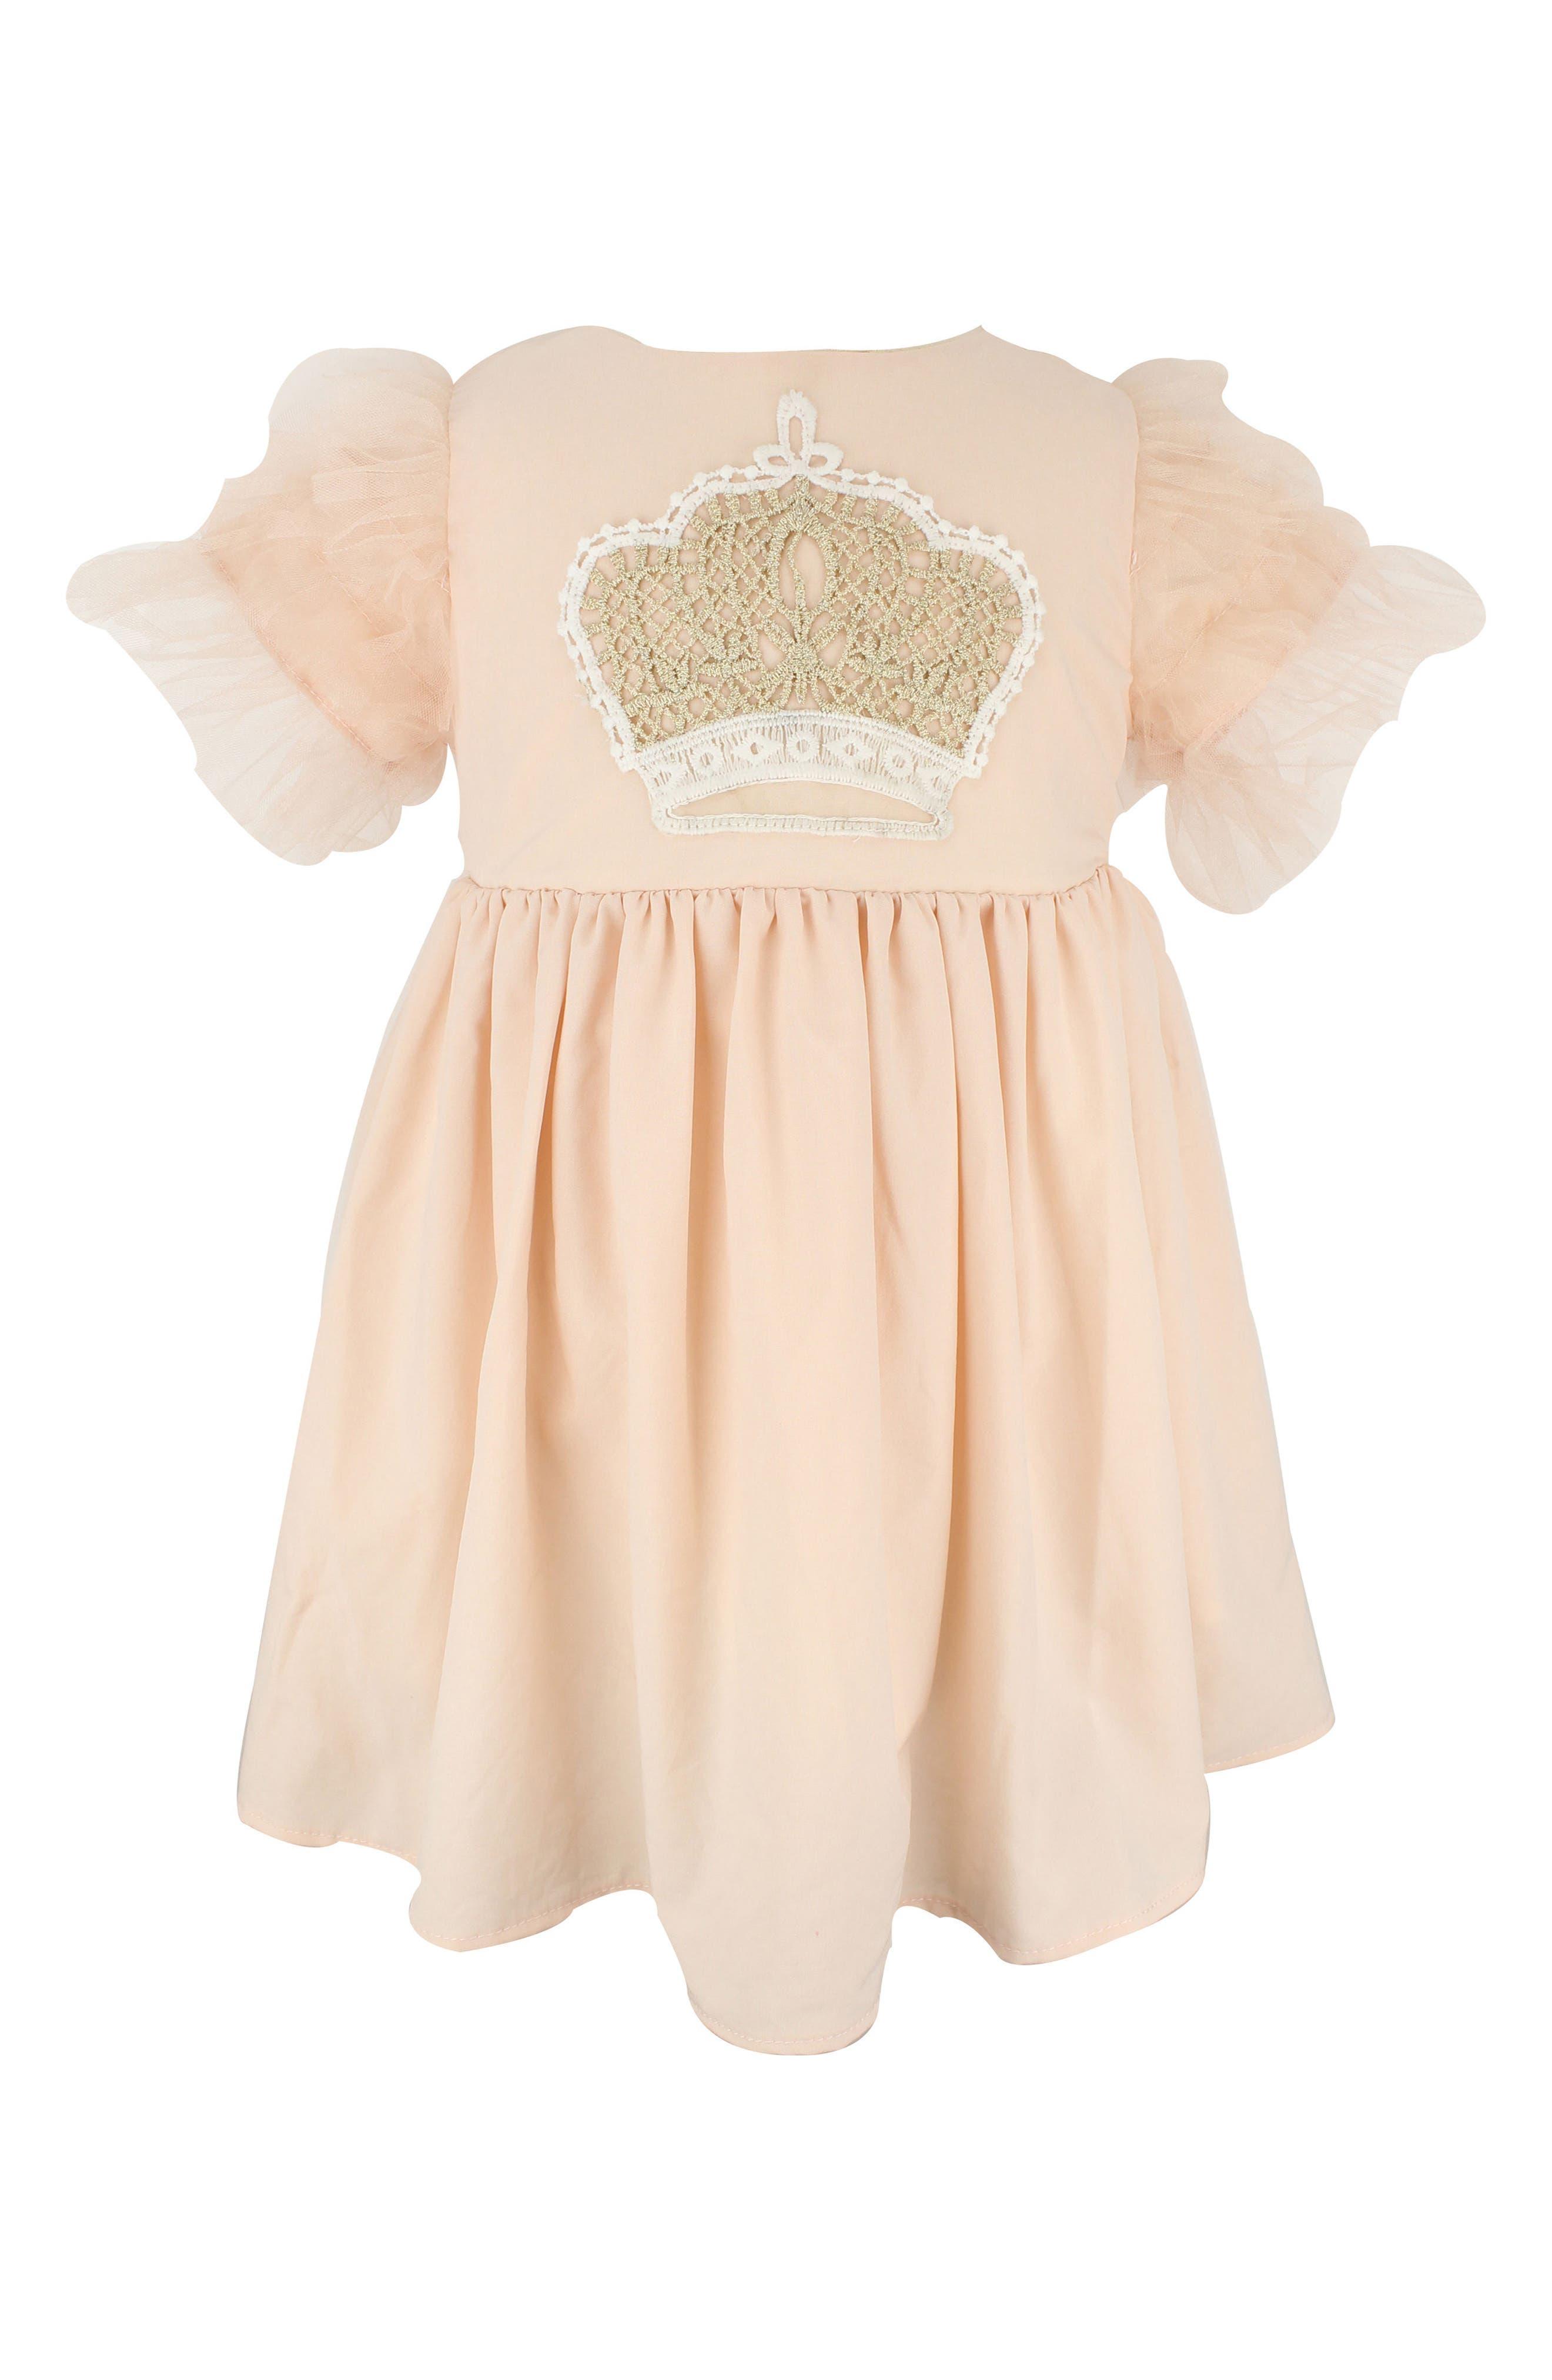 POPATU,                             Crown Appliqué Dress,                             Main thumbnail 1, color,                             PEACH